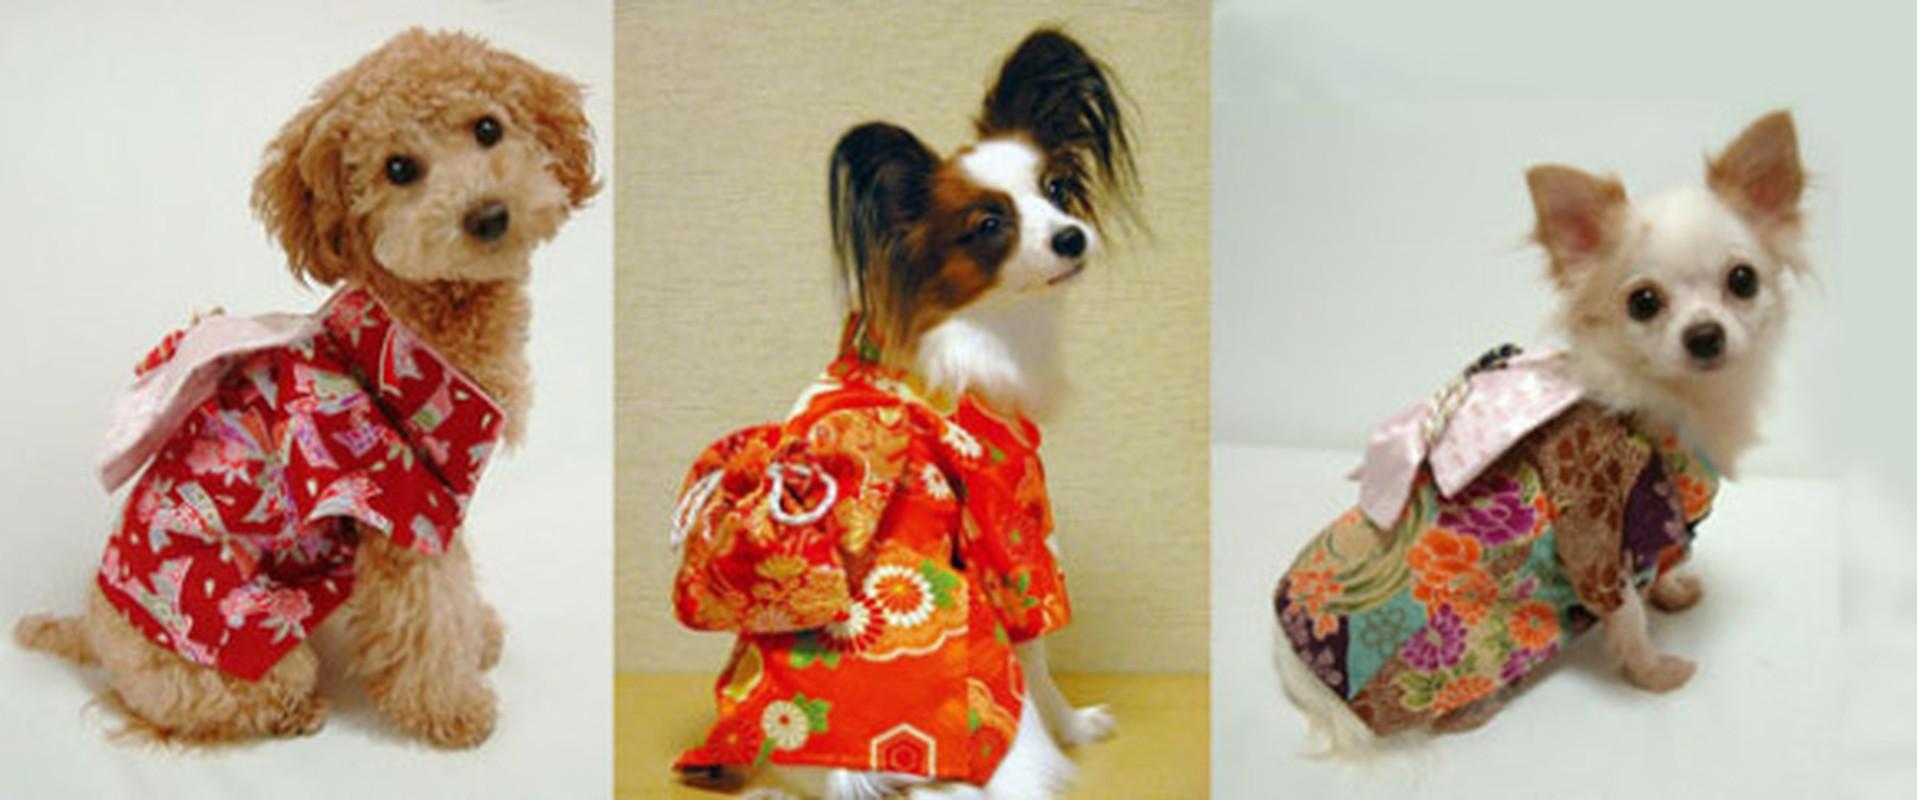 Chet me voi dan cho Nhat Ban dien kimono don nam moi-Hinh-2